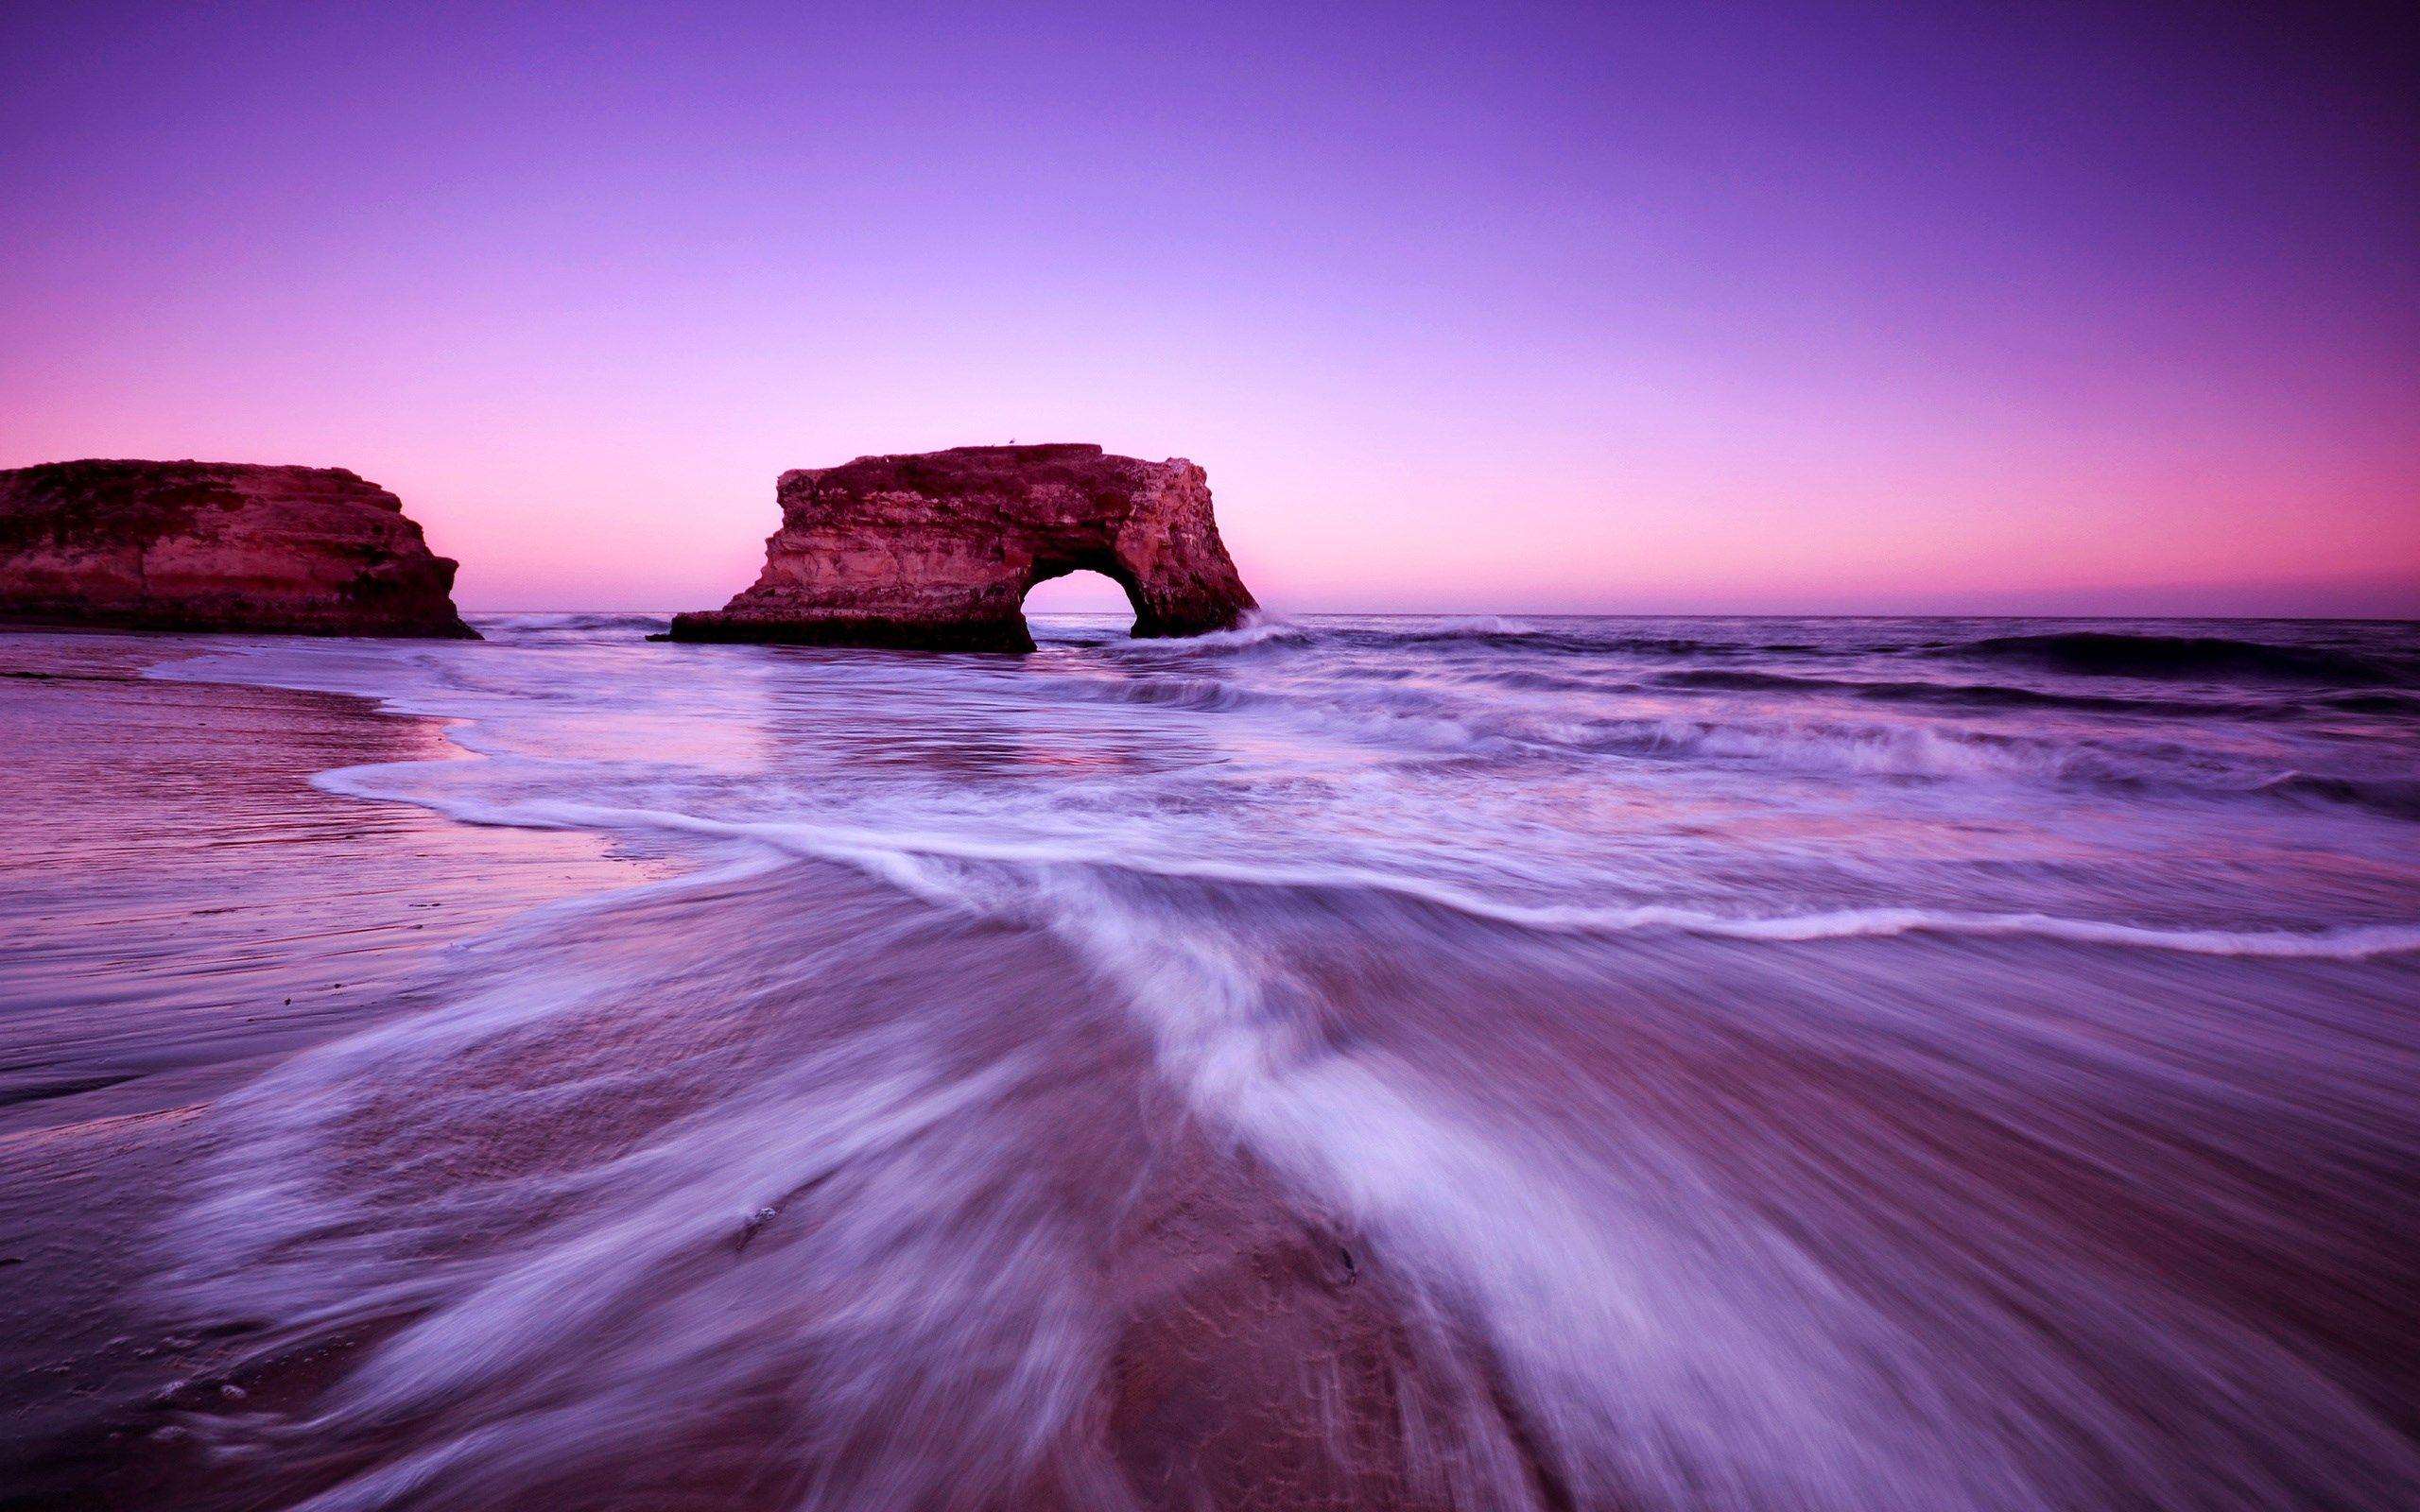 beach widescreen retina imac 2560x1600 | hueputalo | pinterest